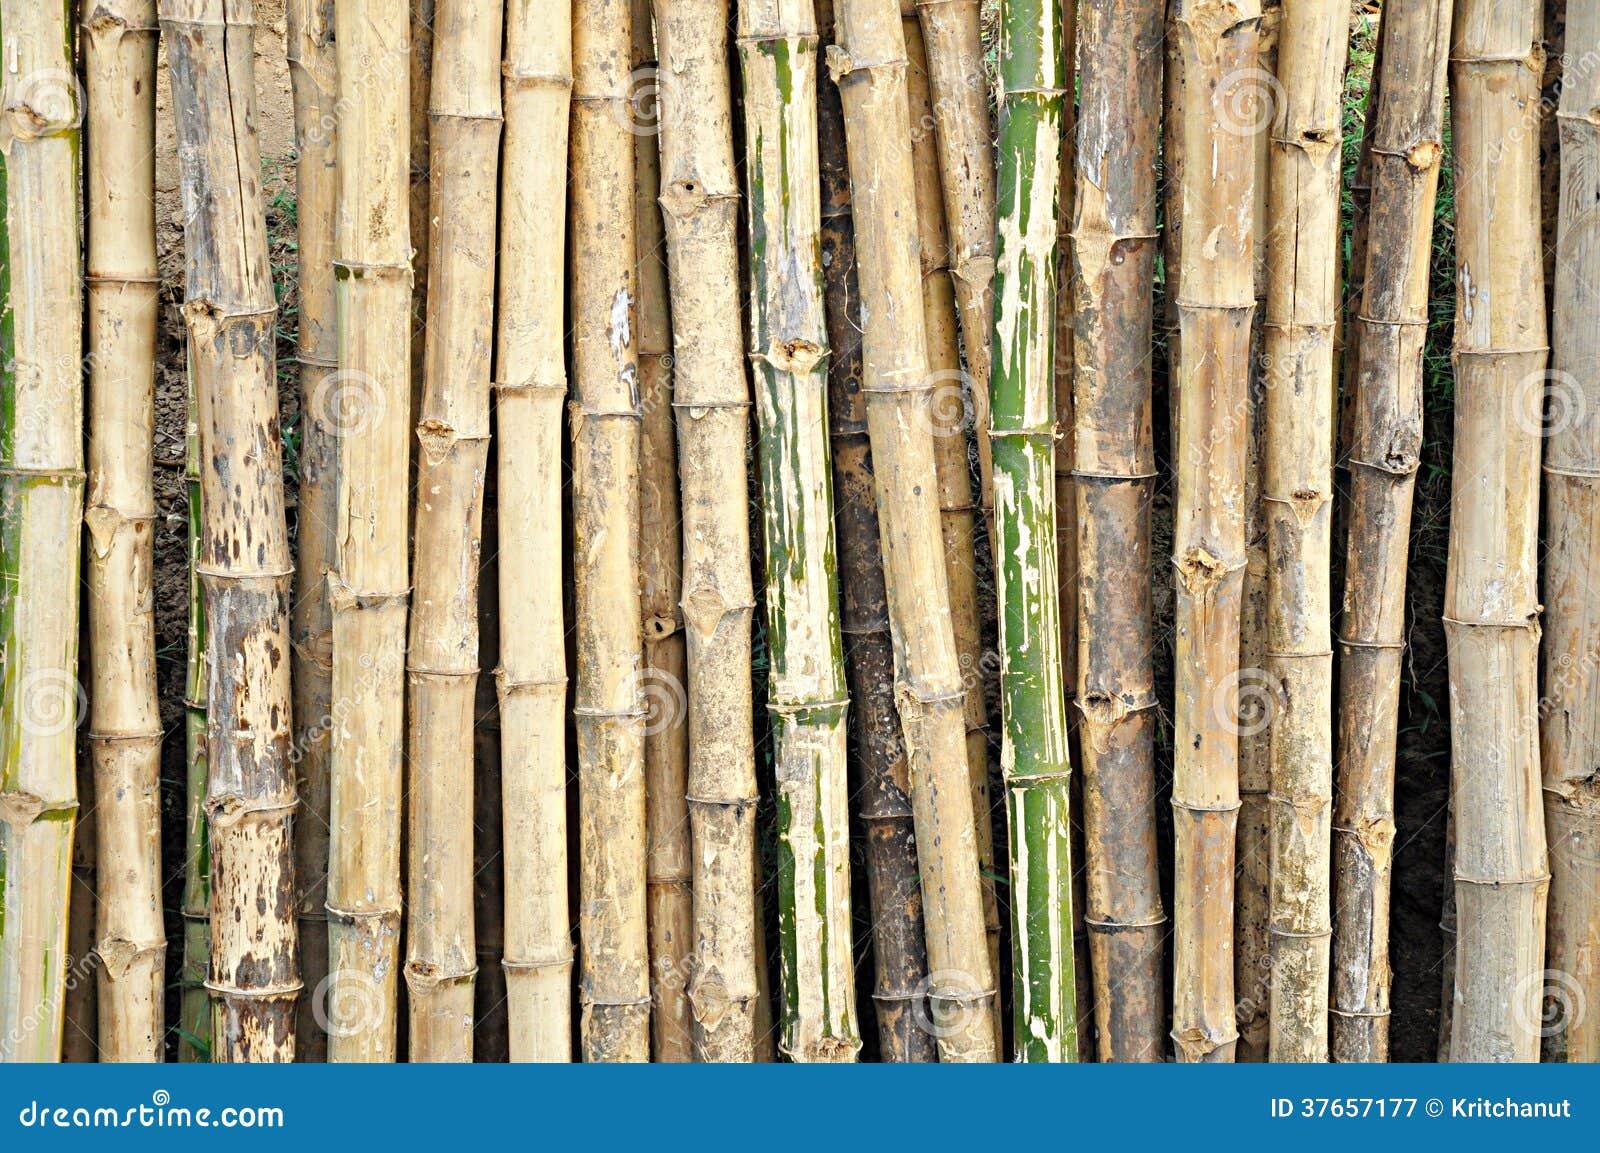 Dry bamboo stalks stock image of plant interior